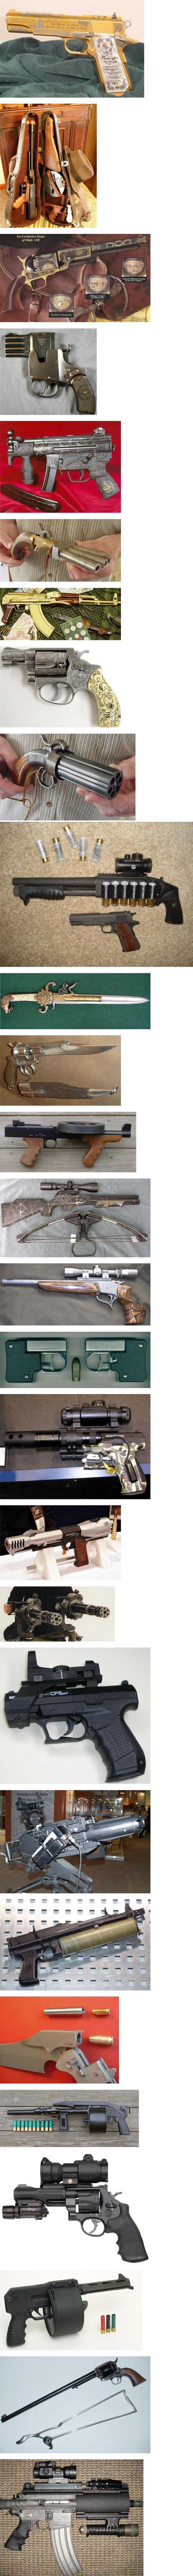 Guns. .. >engraving on a gun >gun being effective pick one. Guns >engraving on a gun >gun being effective pick one